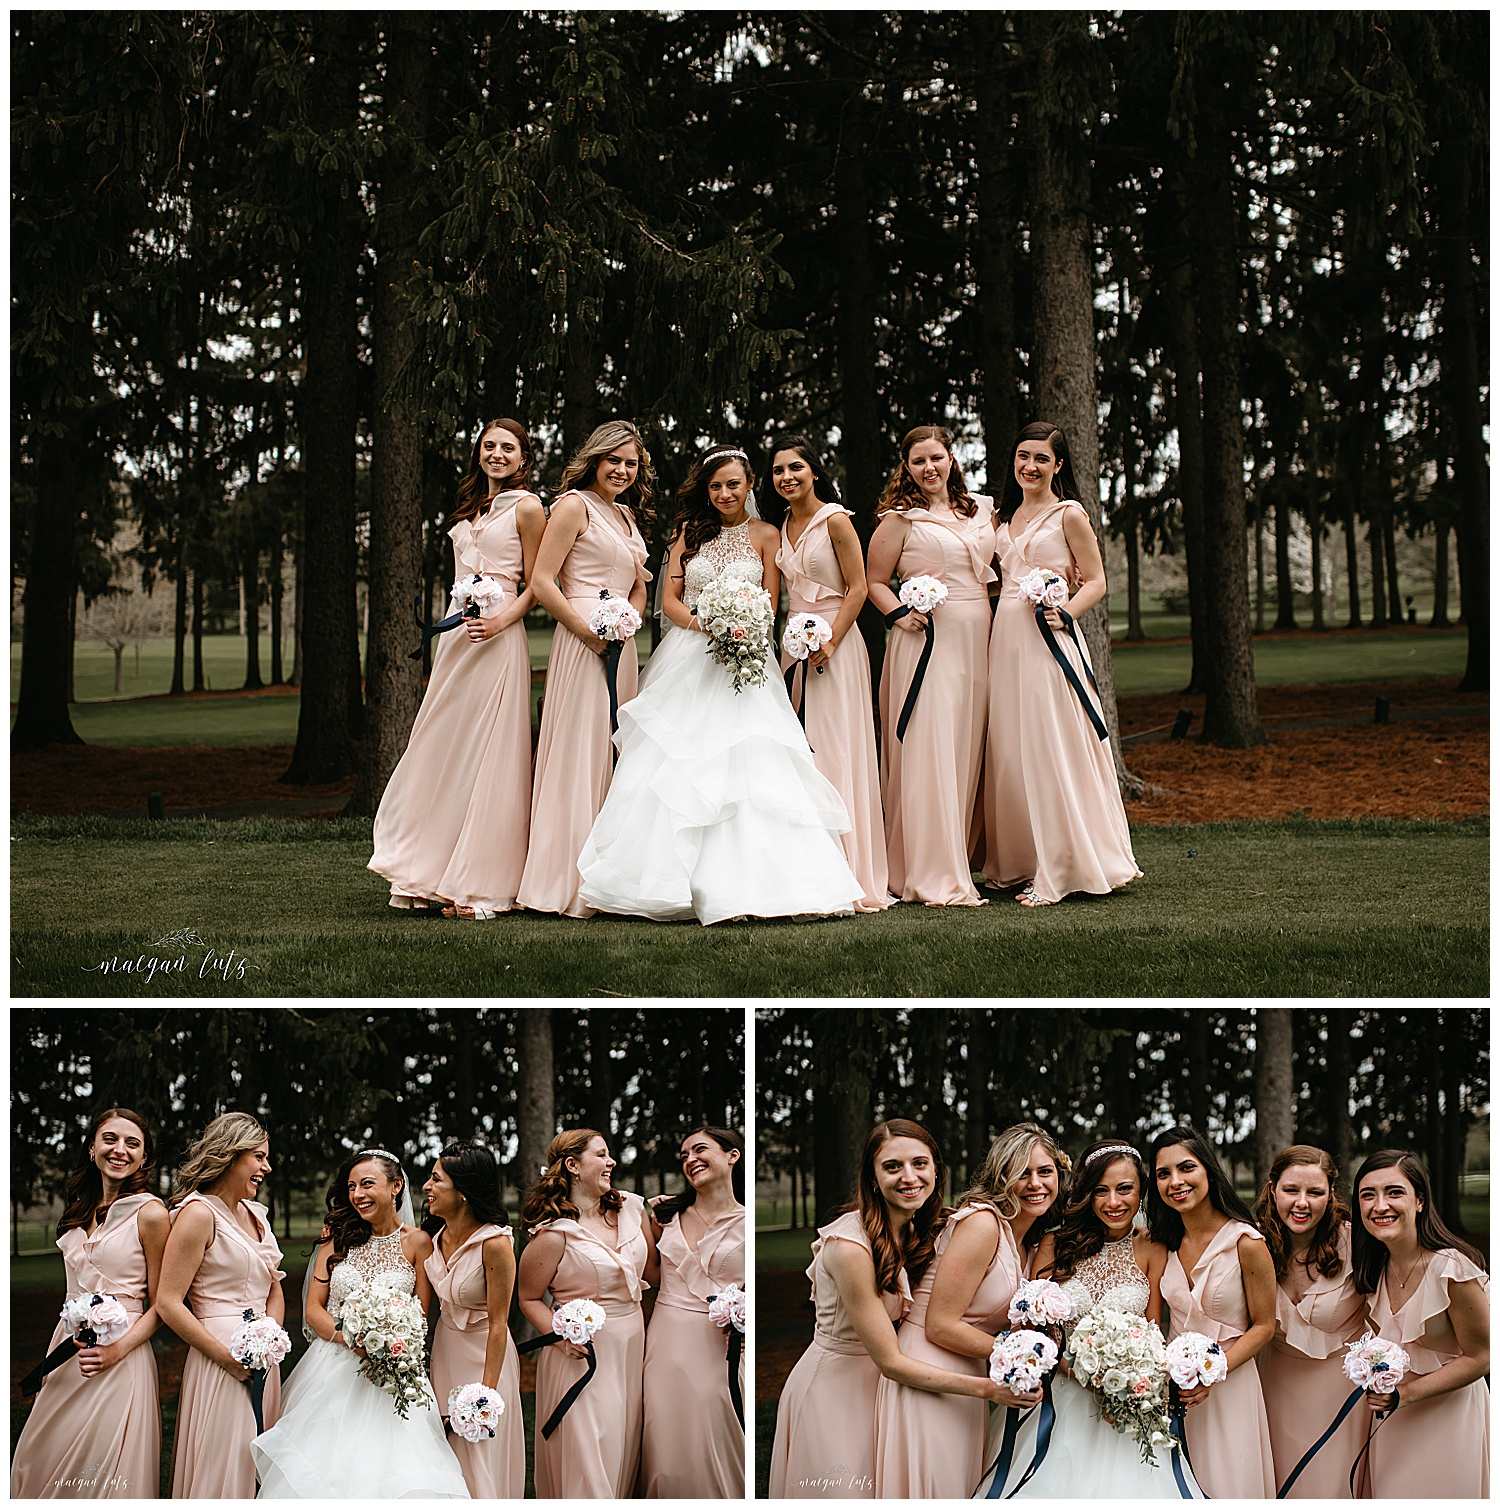 NEPA-Lehigh-Valley-Wedding-Photographer-at-Glen-Oak-Country-Club-Clarks-Summit-PA_0039.jpg